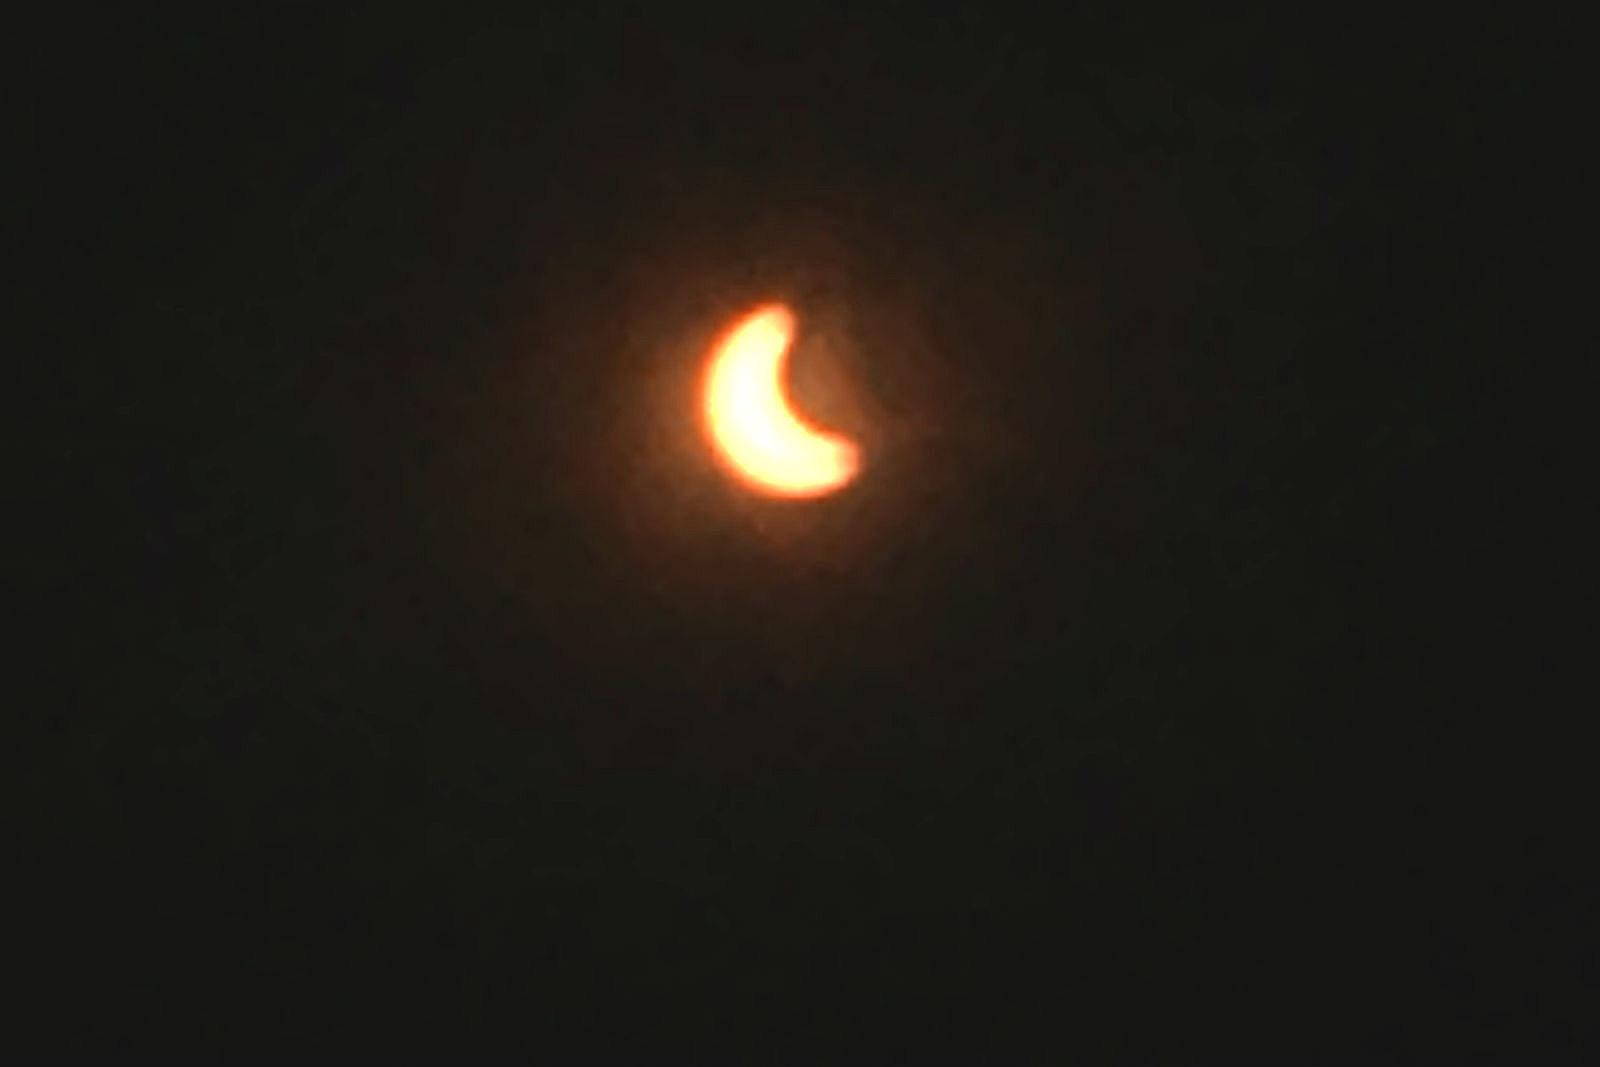 Eclipse from Marcy, NY